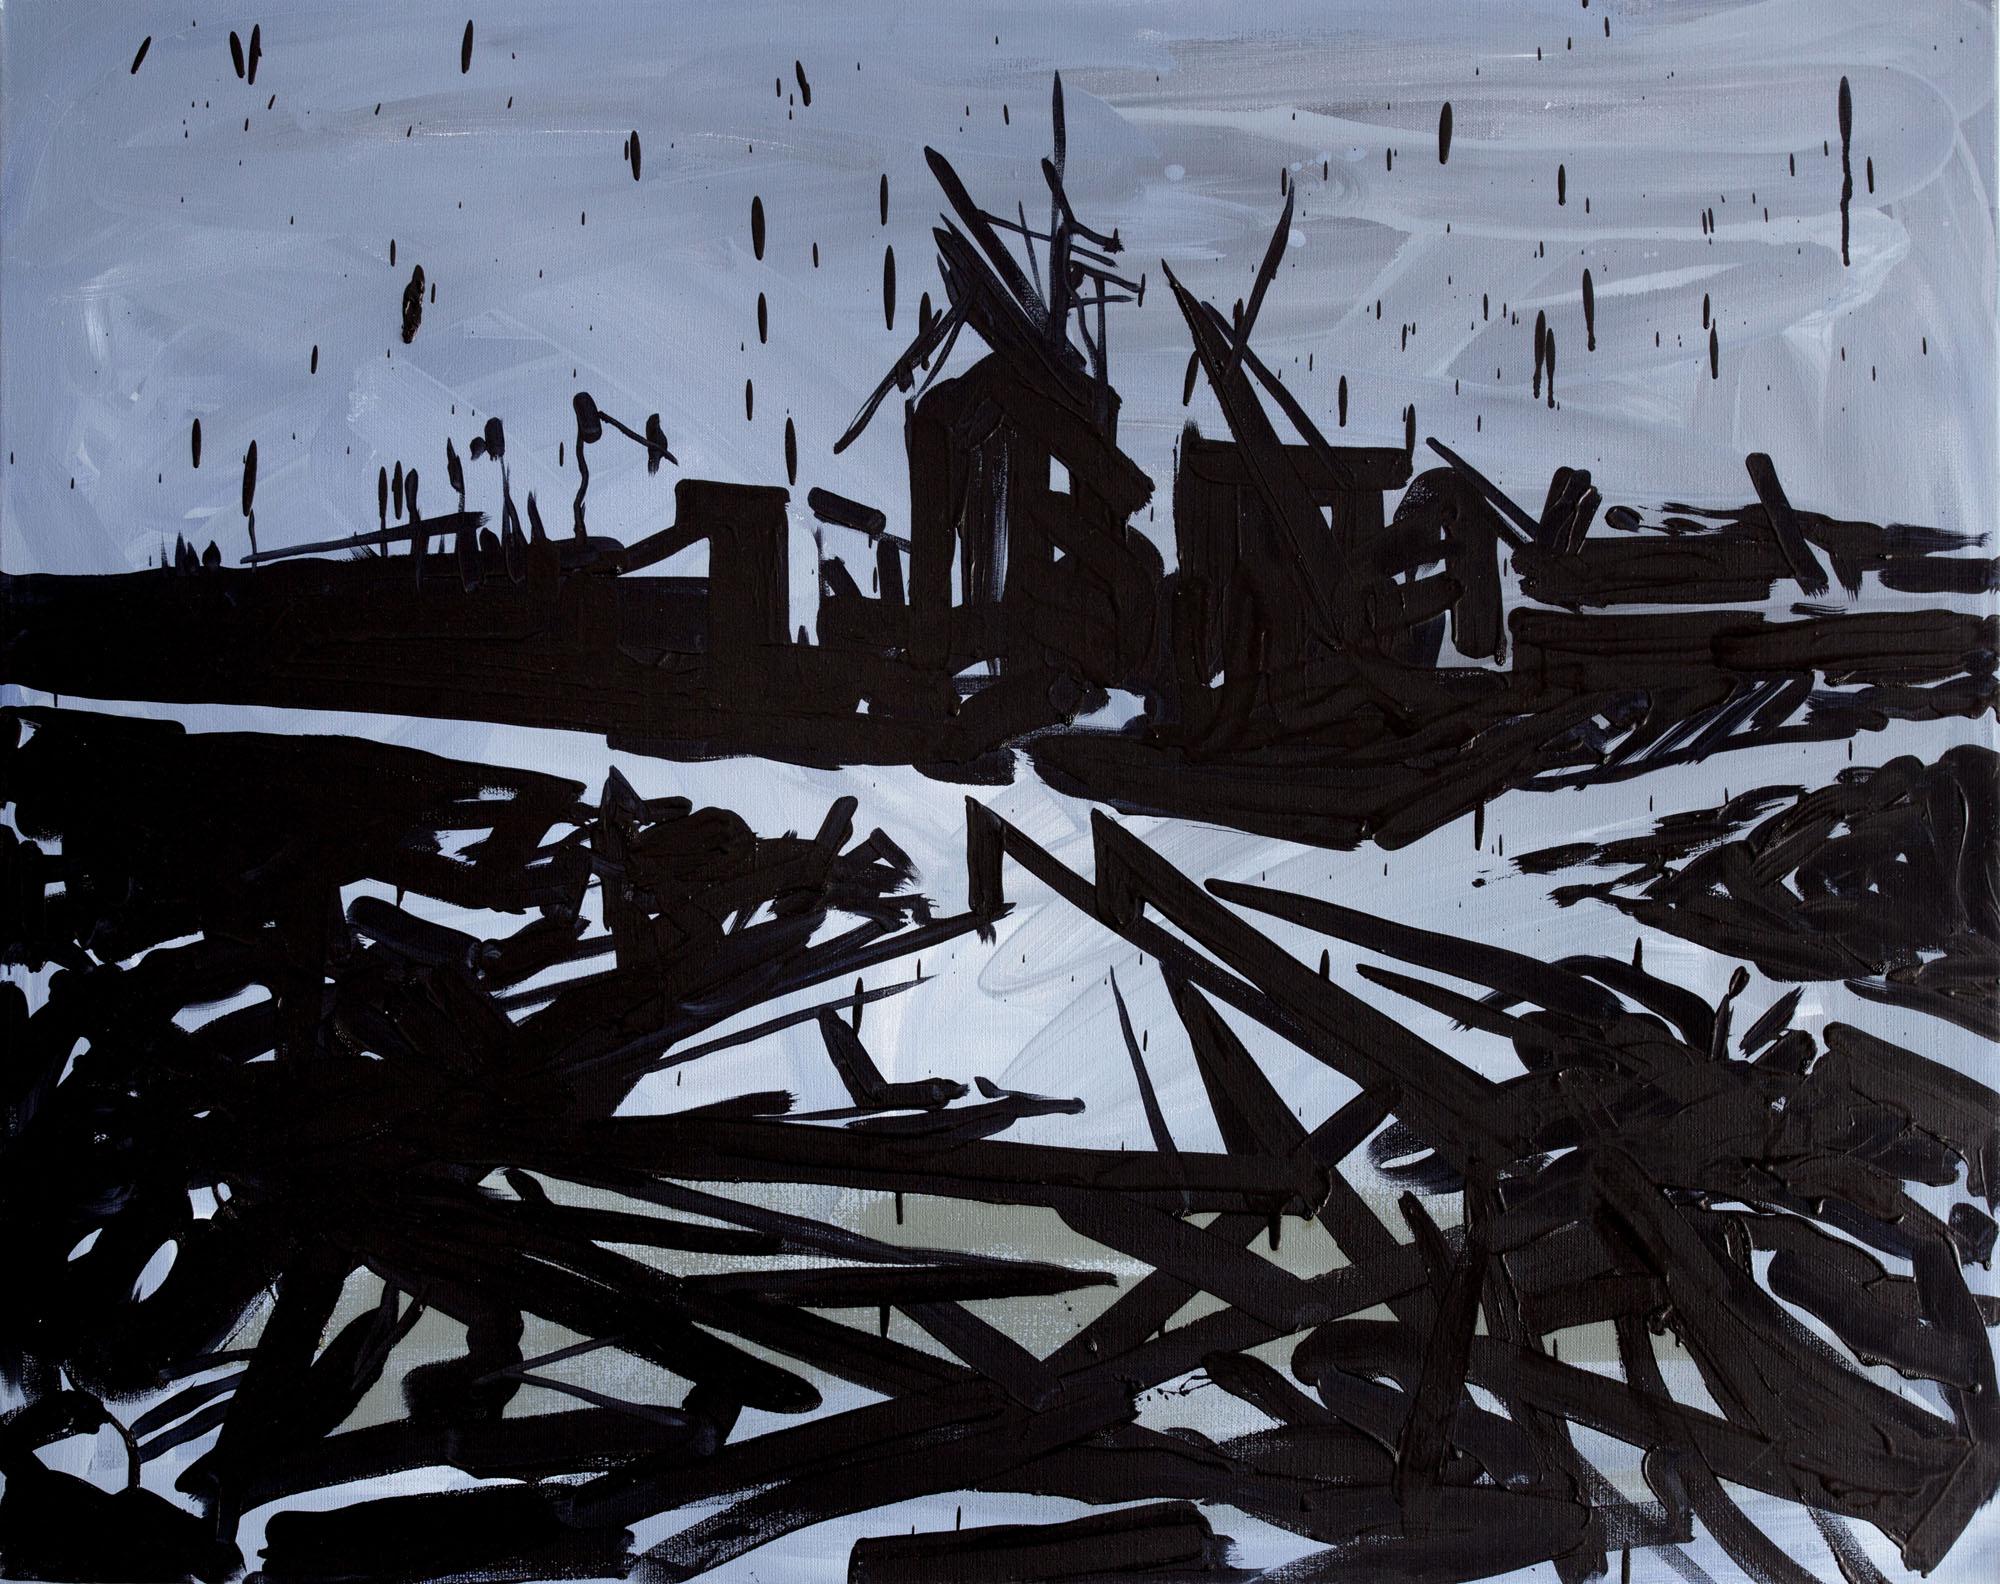 Jacek Doroszenko - 10 minutes, oil and acrylic on canvas 01